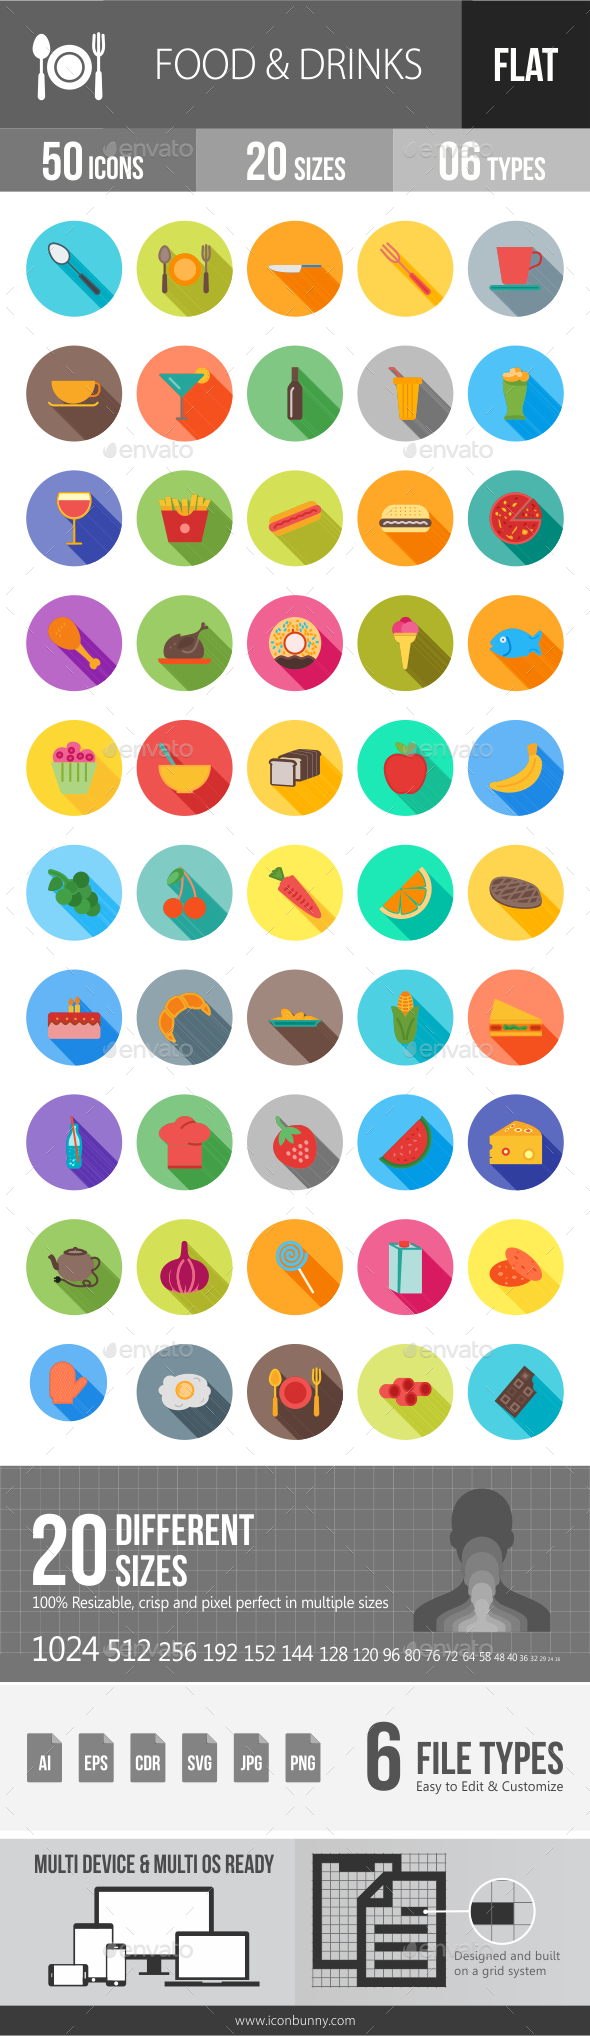 Food & Drinks Flat Shadowed Icons